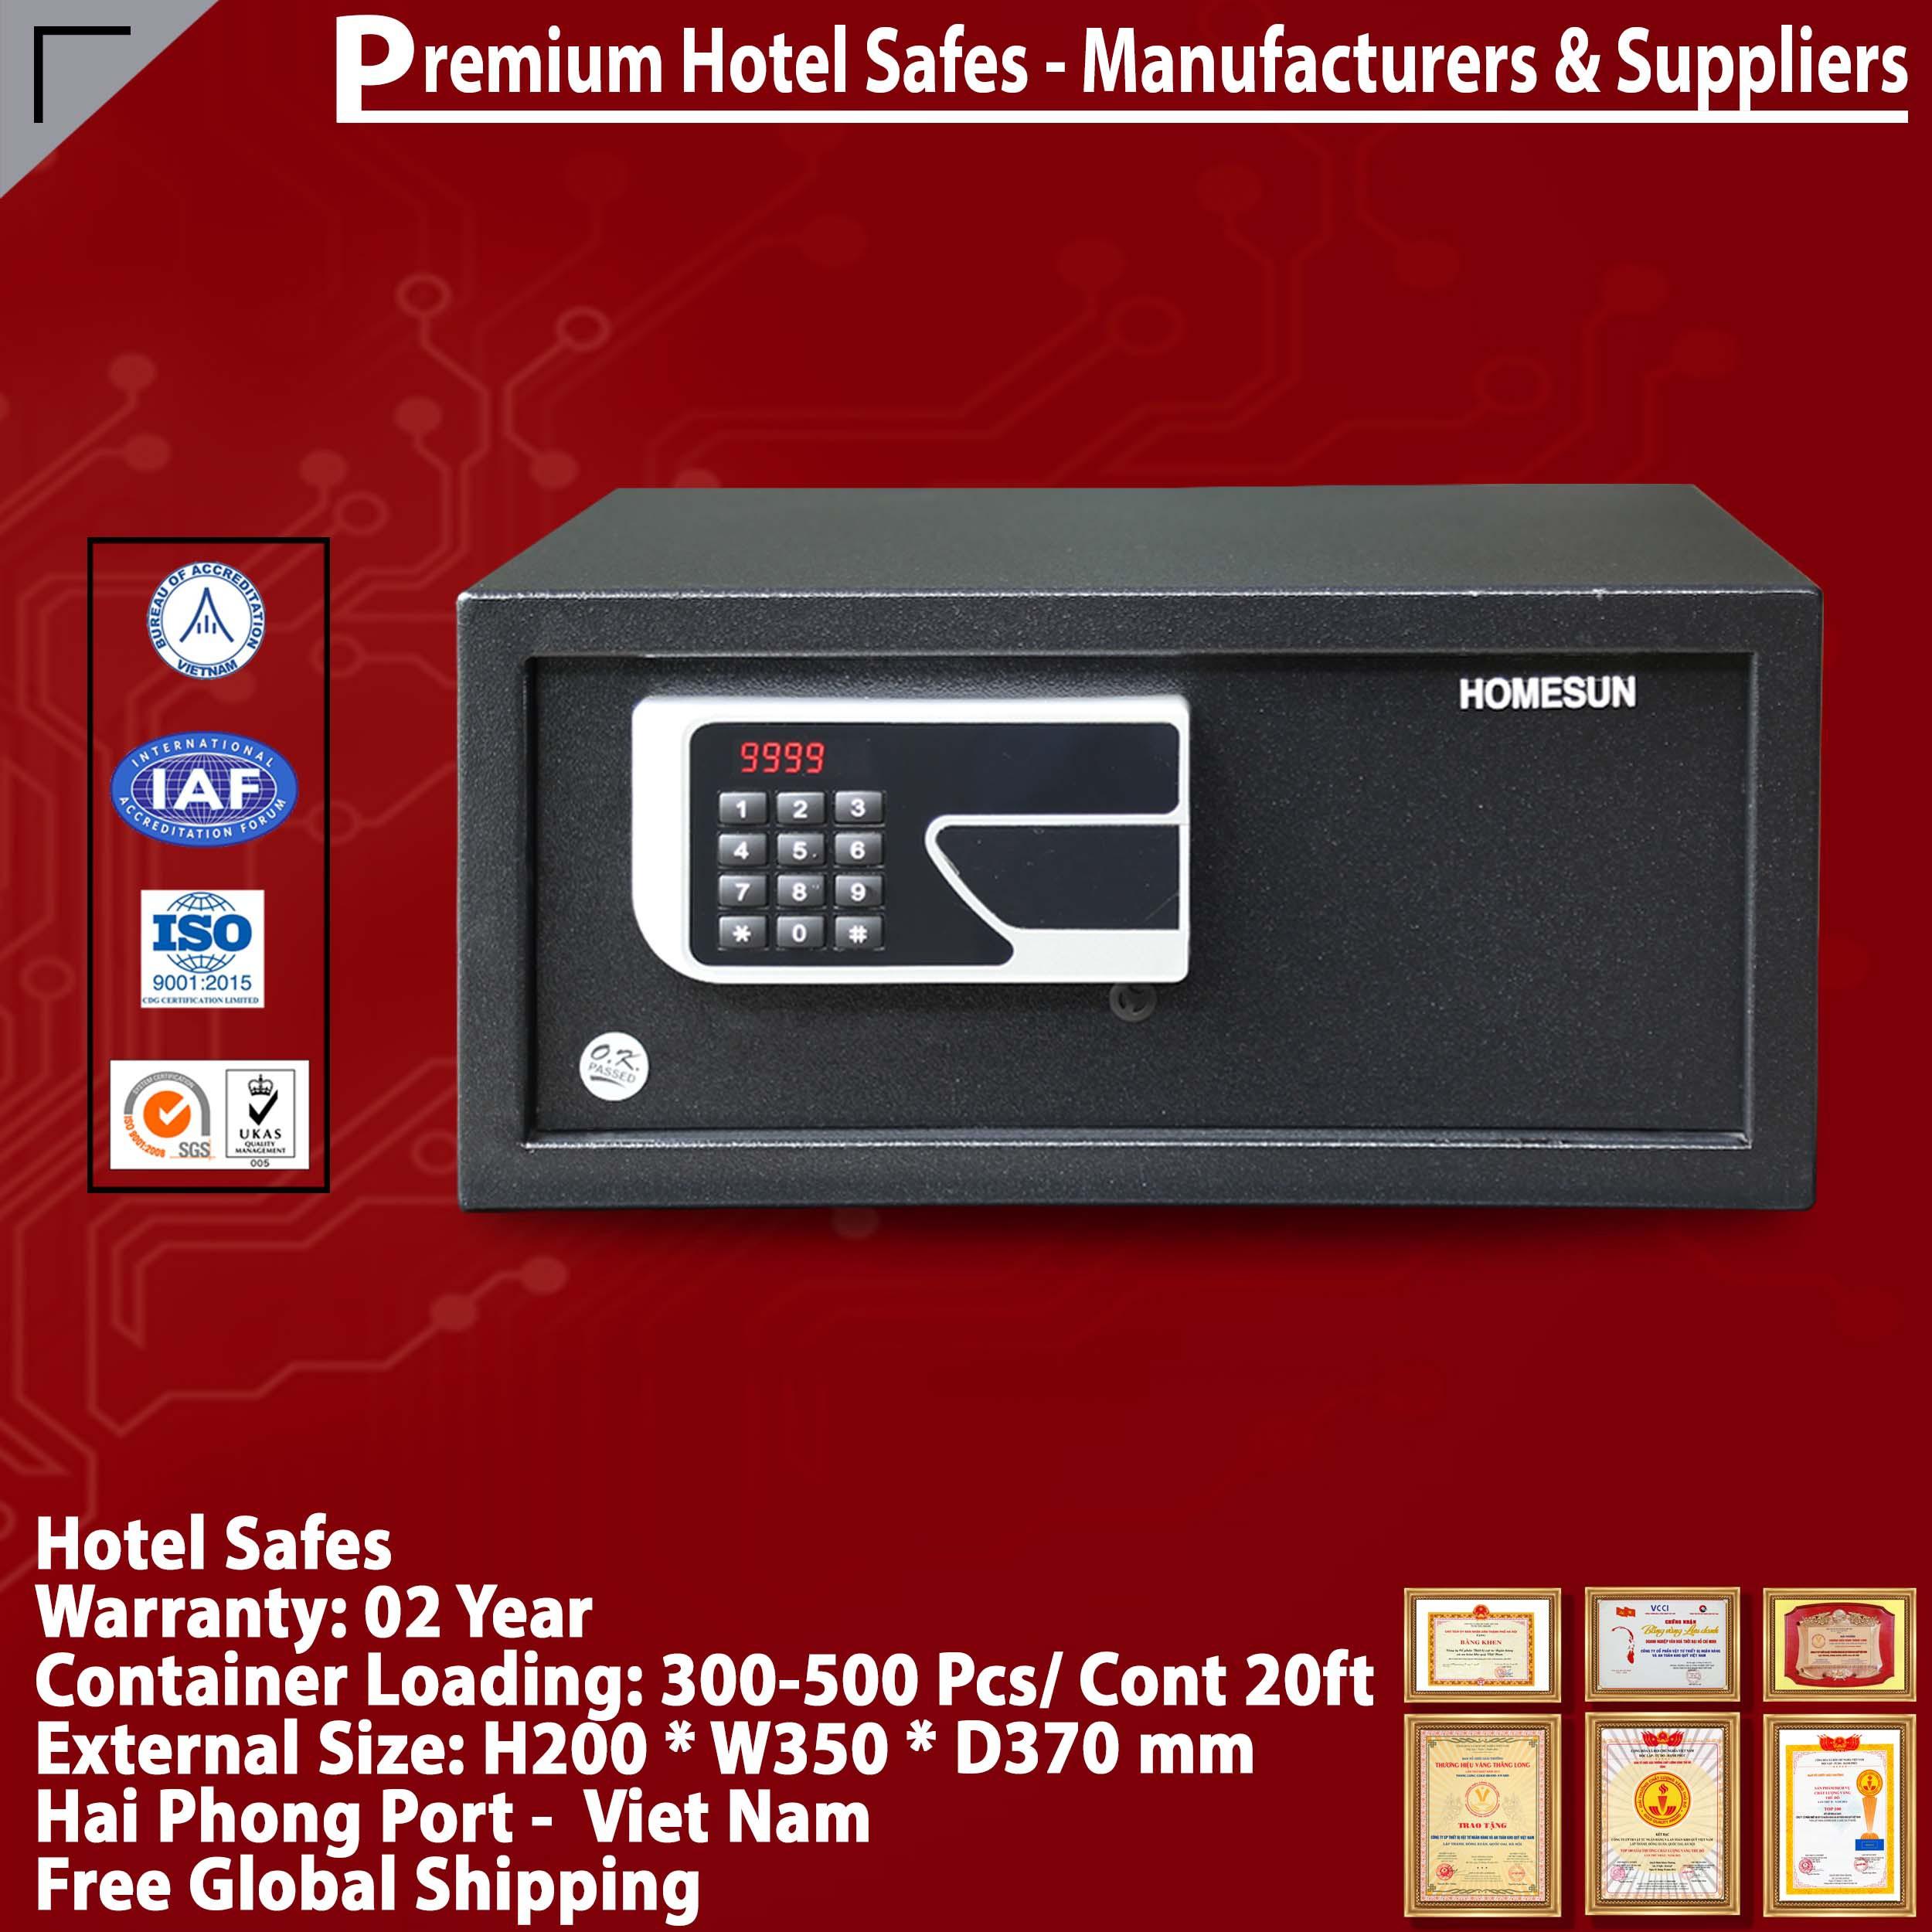 Best Hotel Safe For Home